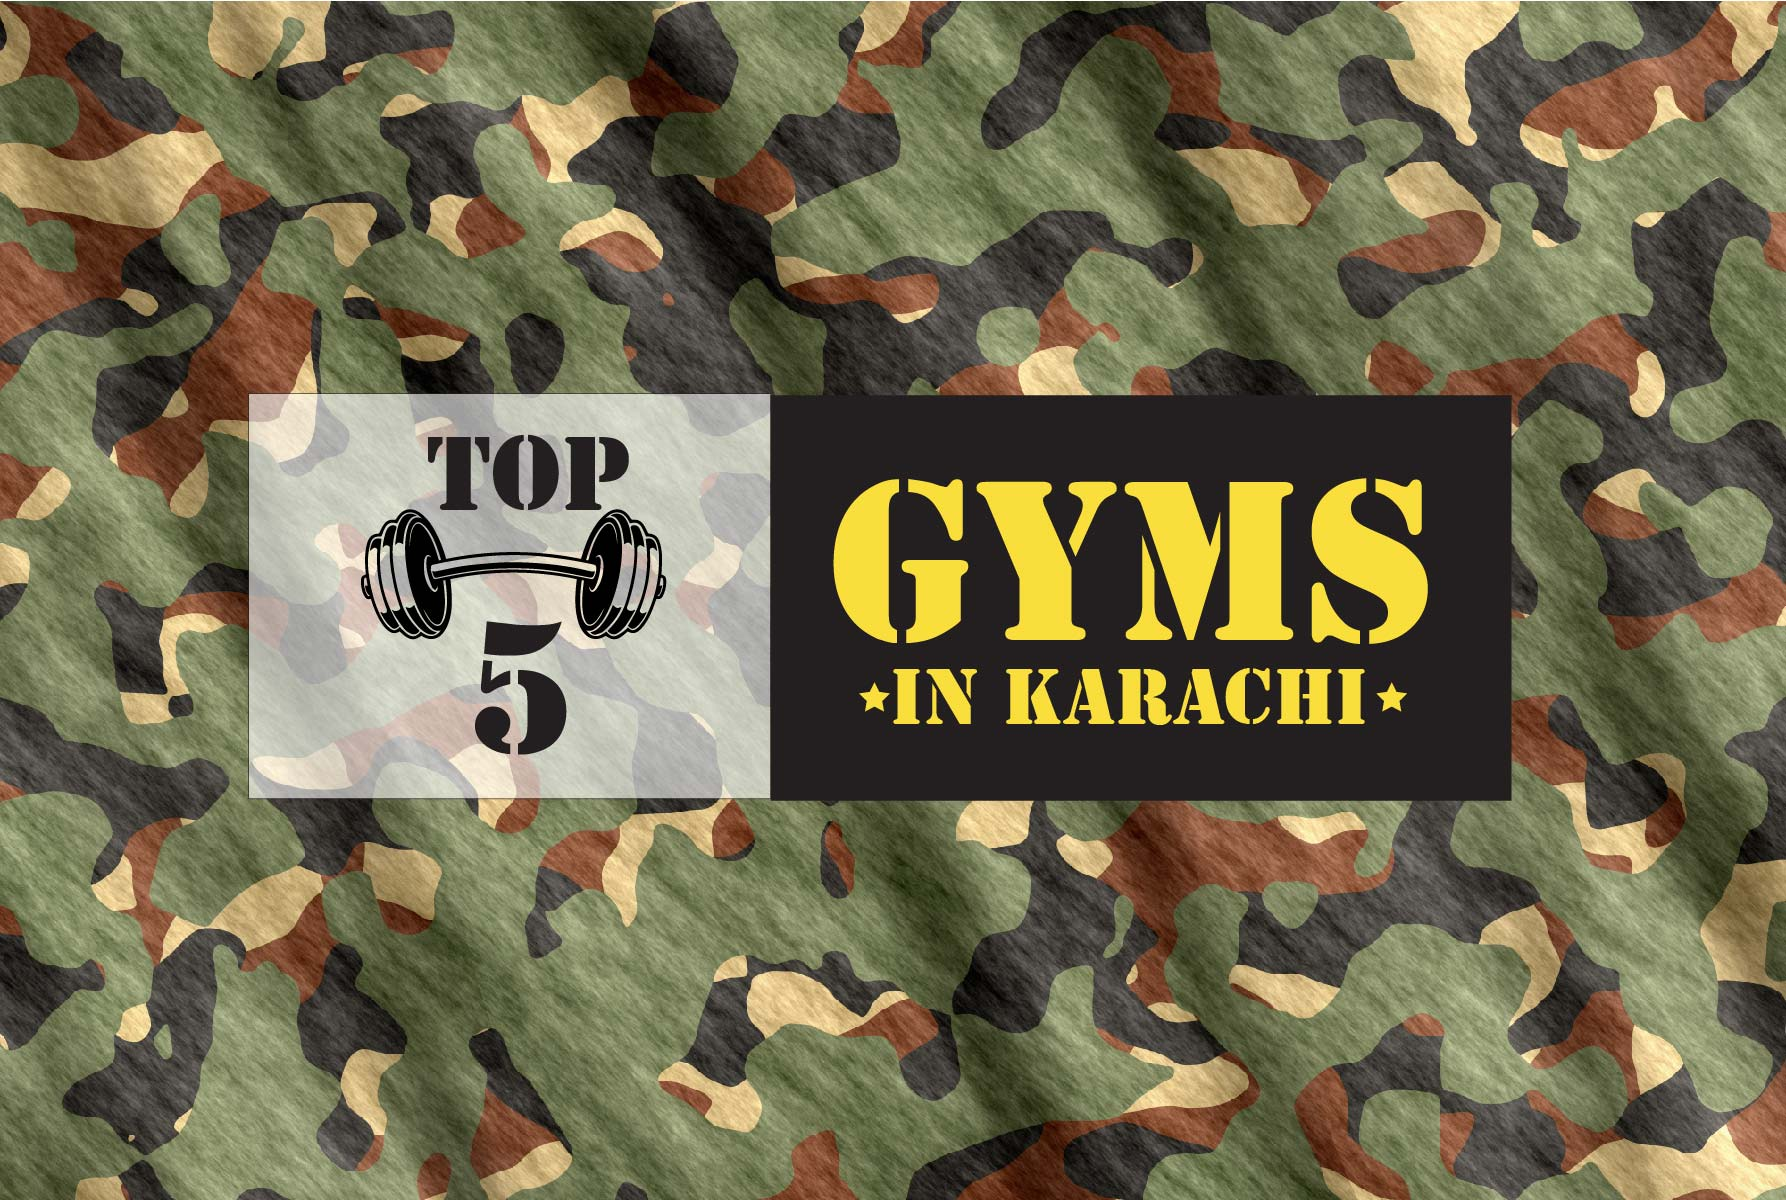 Top 5 Gyms in Karachi